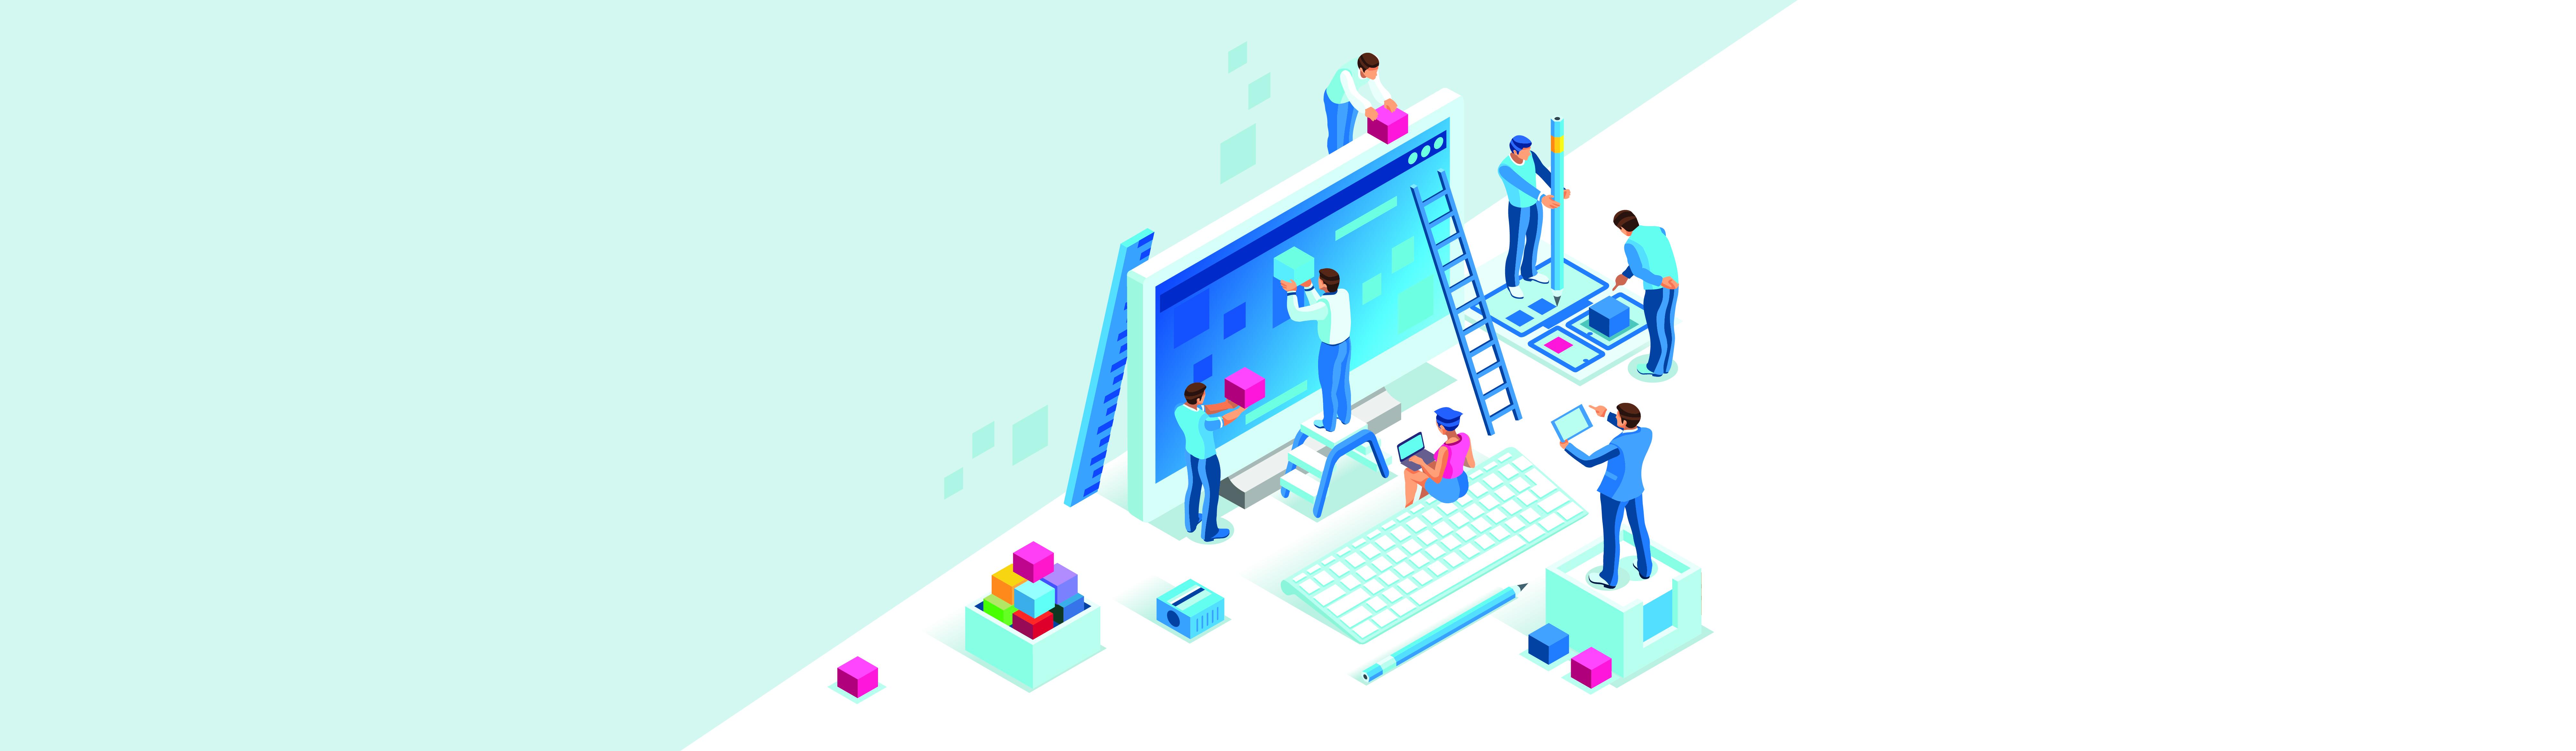 Daniele torres elaboracao projetos banner plataforma